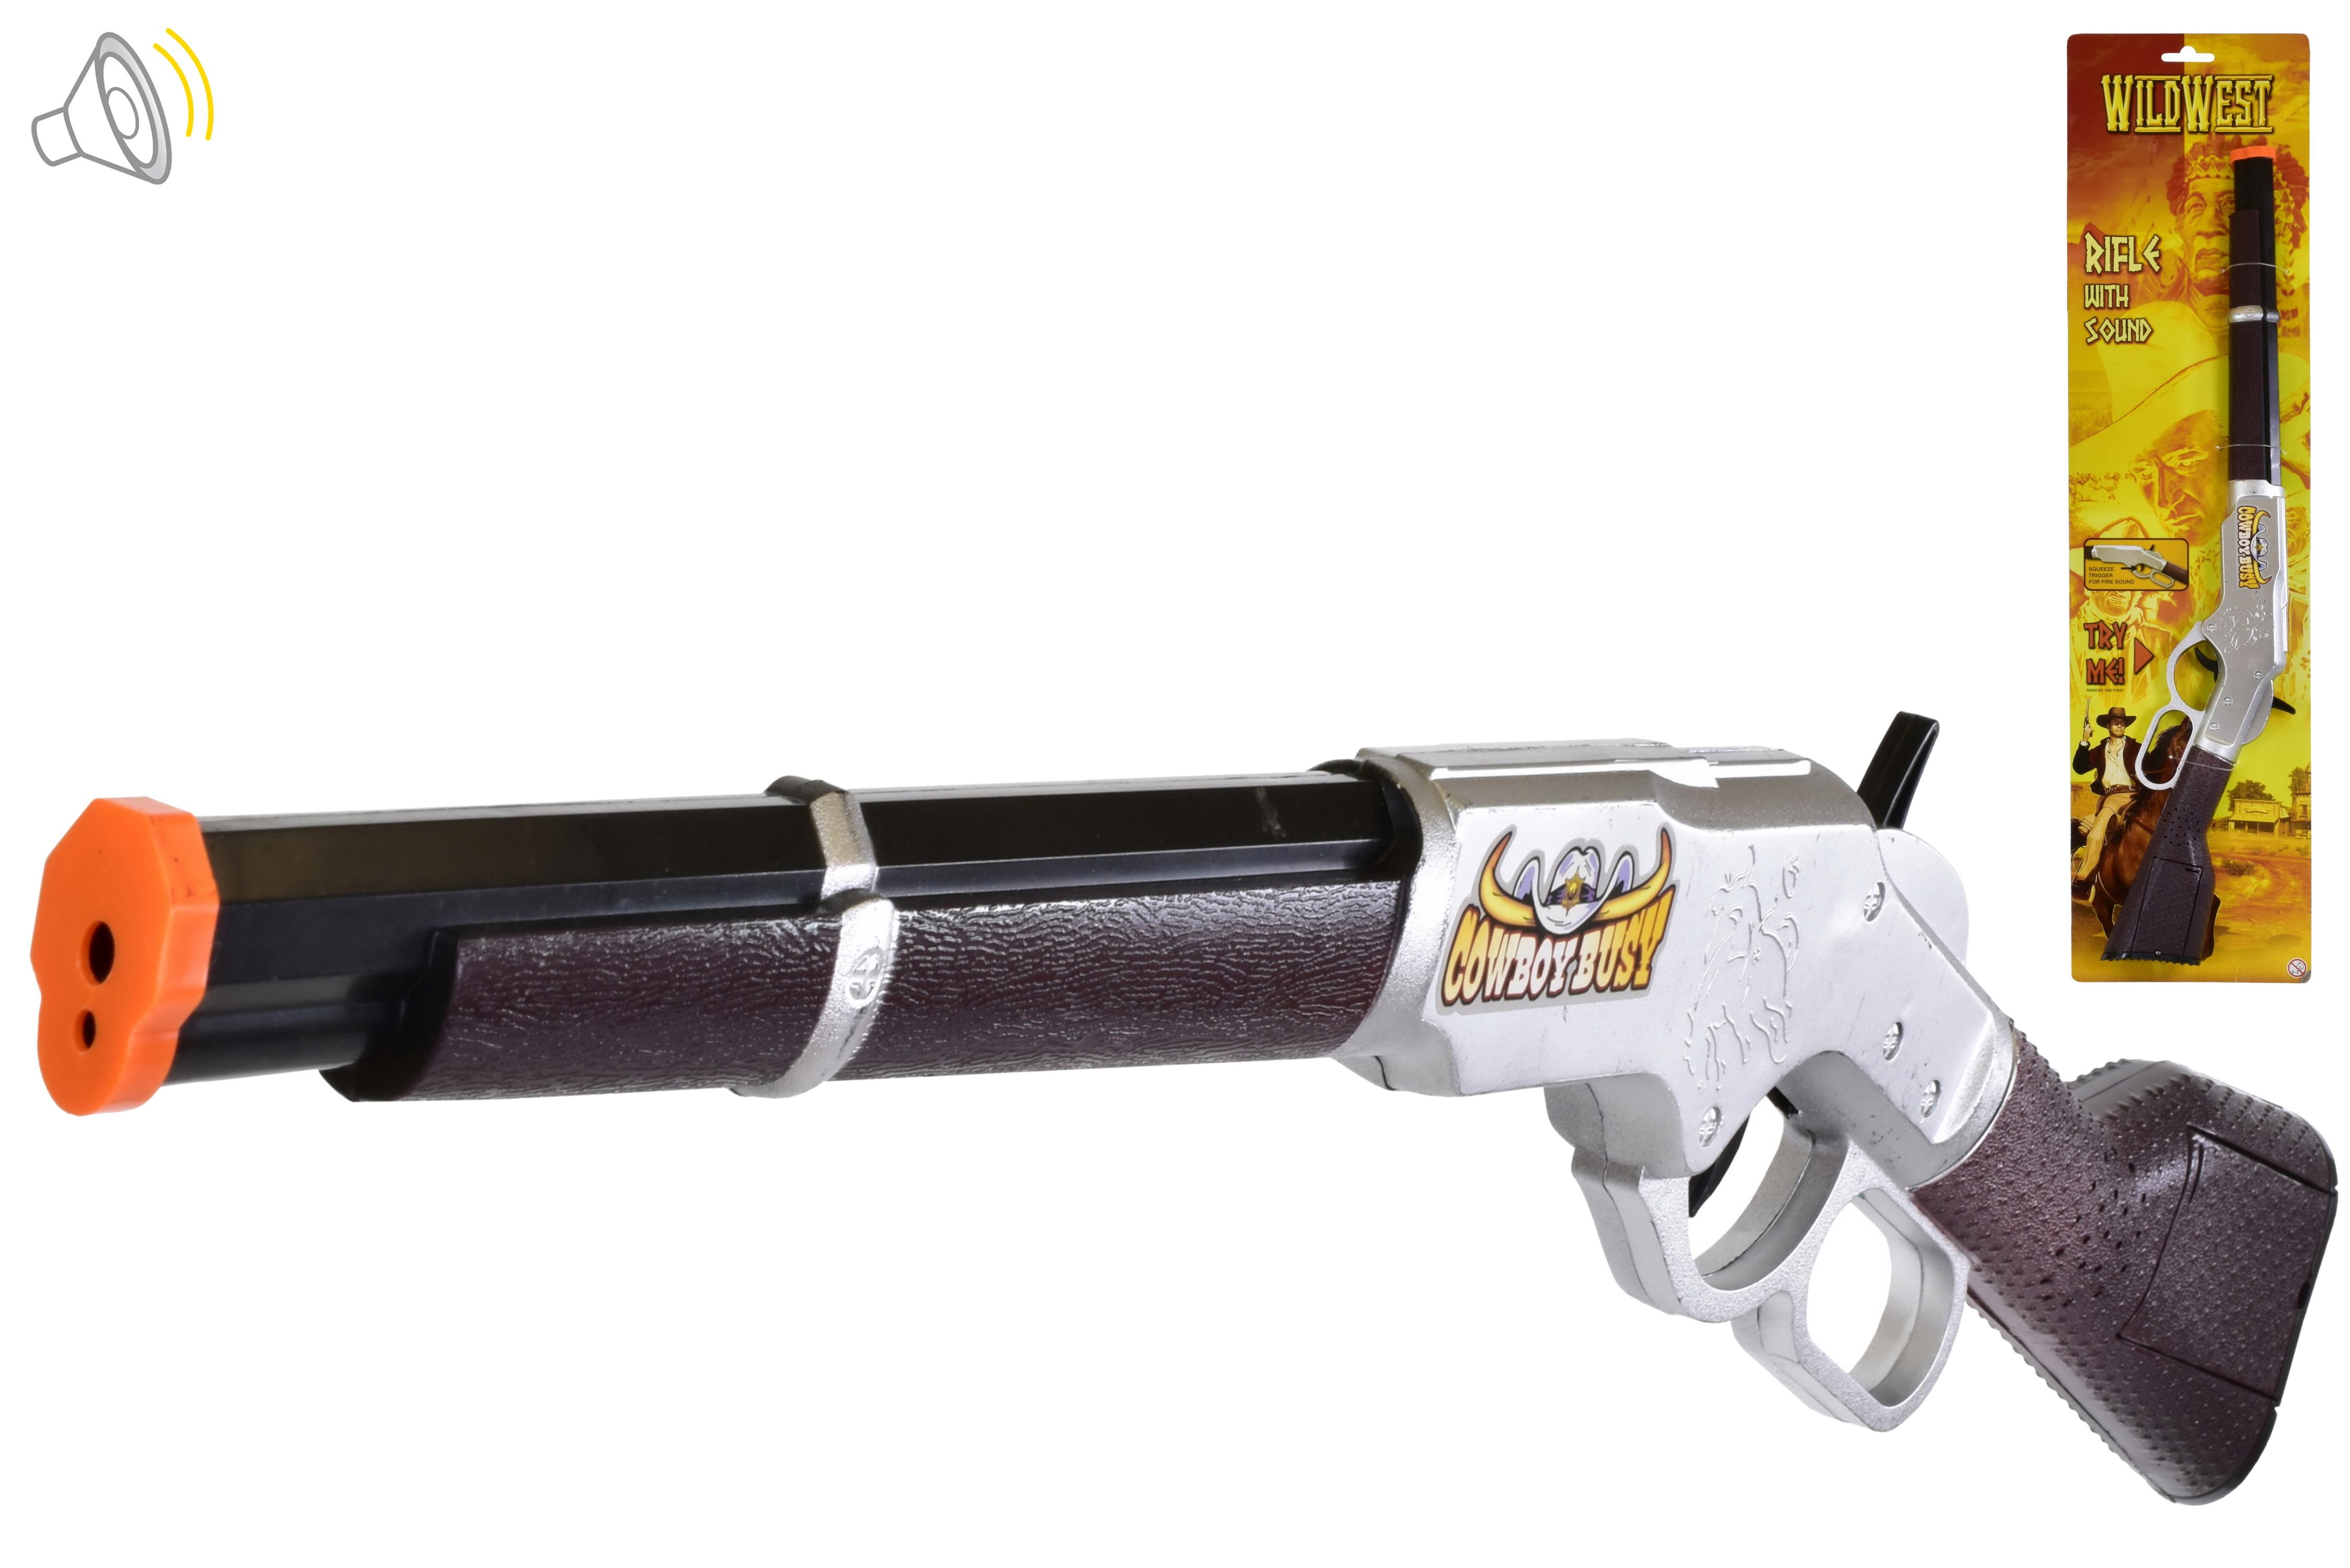 Wild West Rifle With Sound On Tie Card